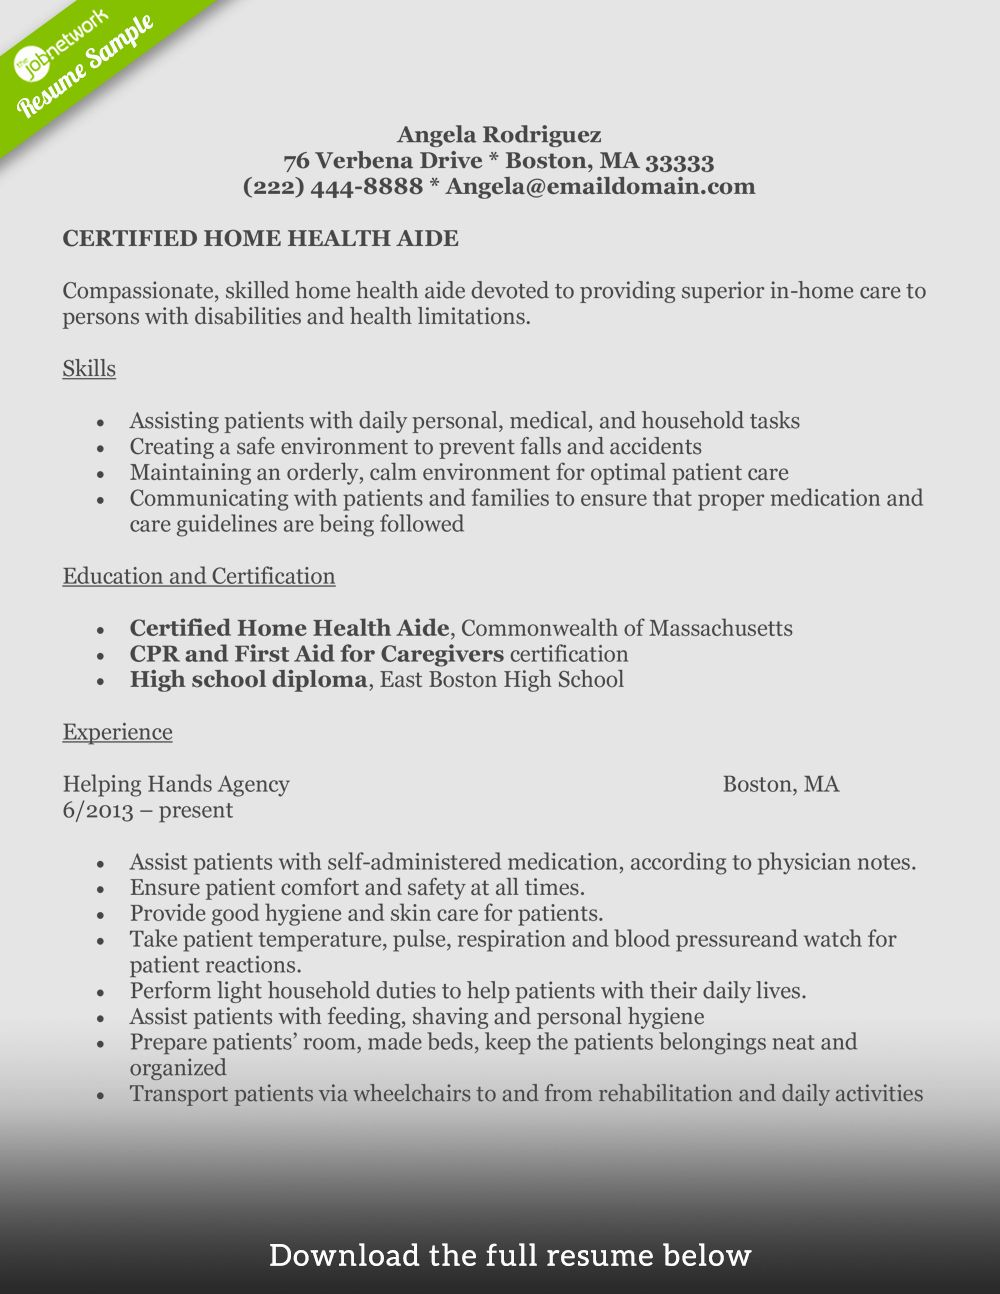 Home Health Care Resume Example Beautiful How to Write A